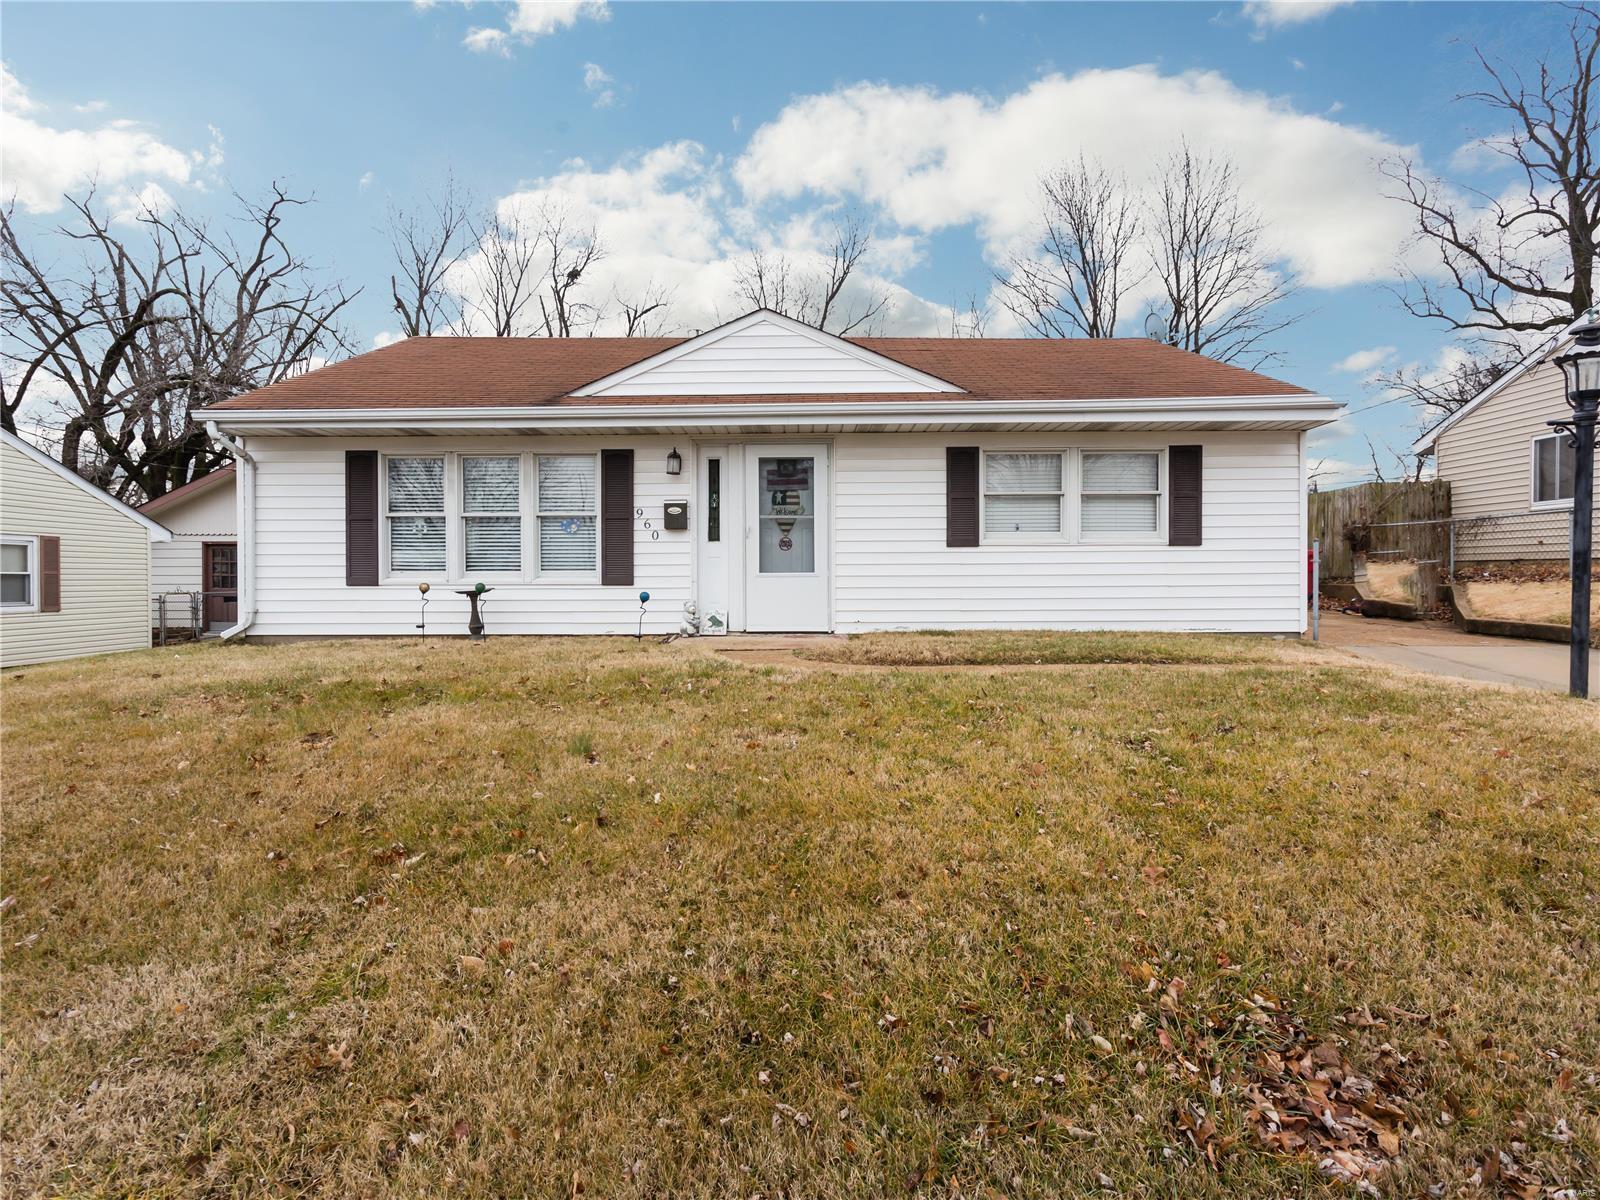 960 Saint Ferdinand Property Photo - Florissant, MO real estate listing